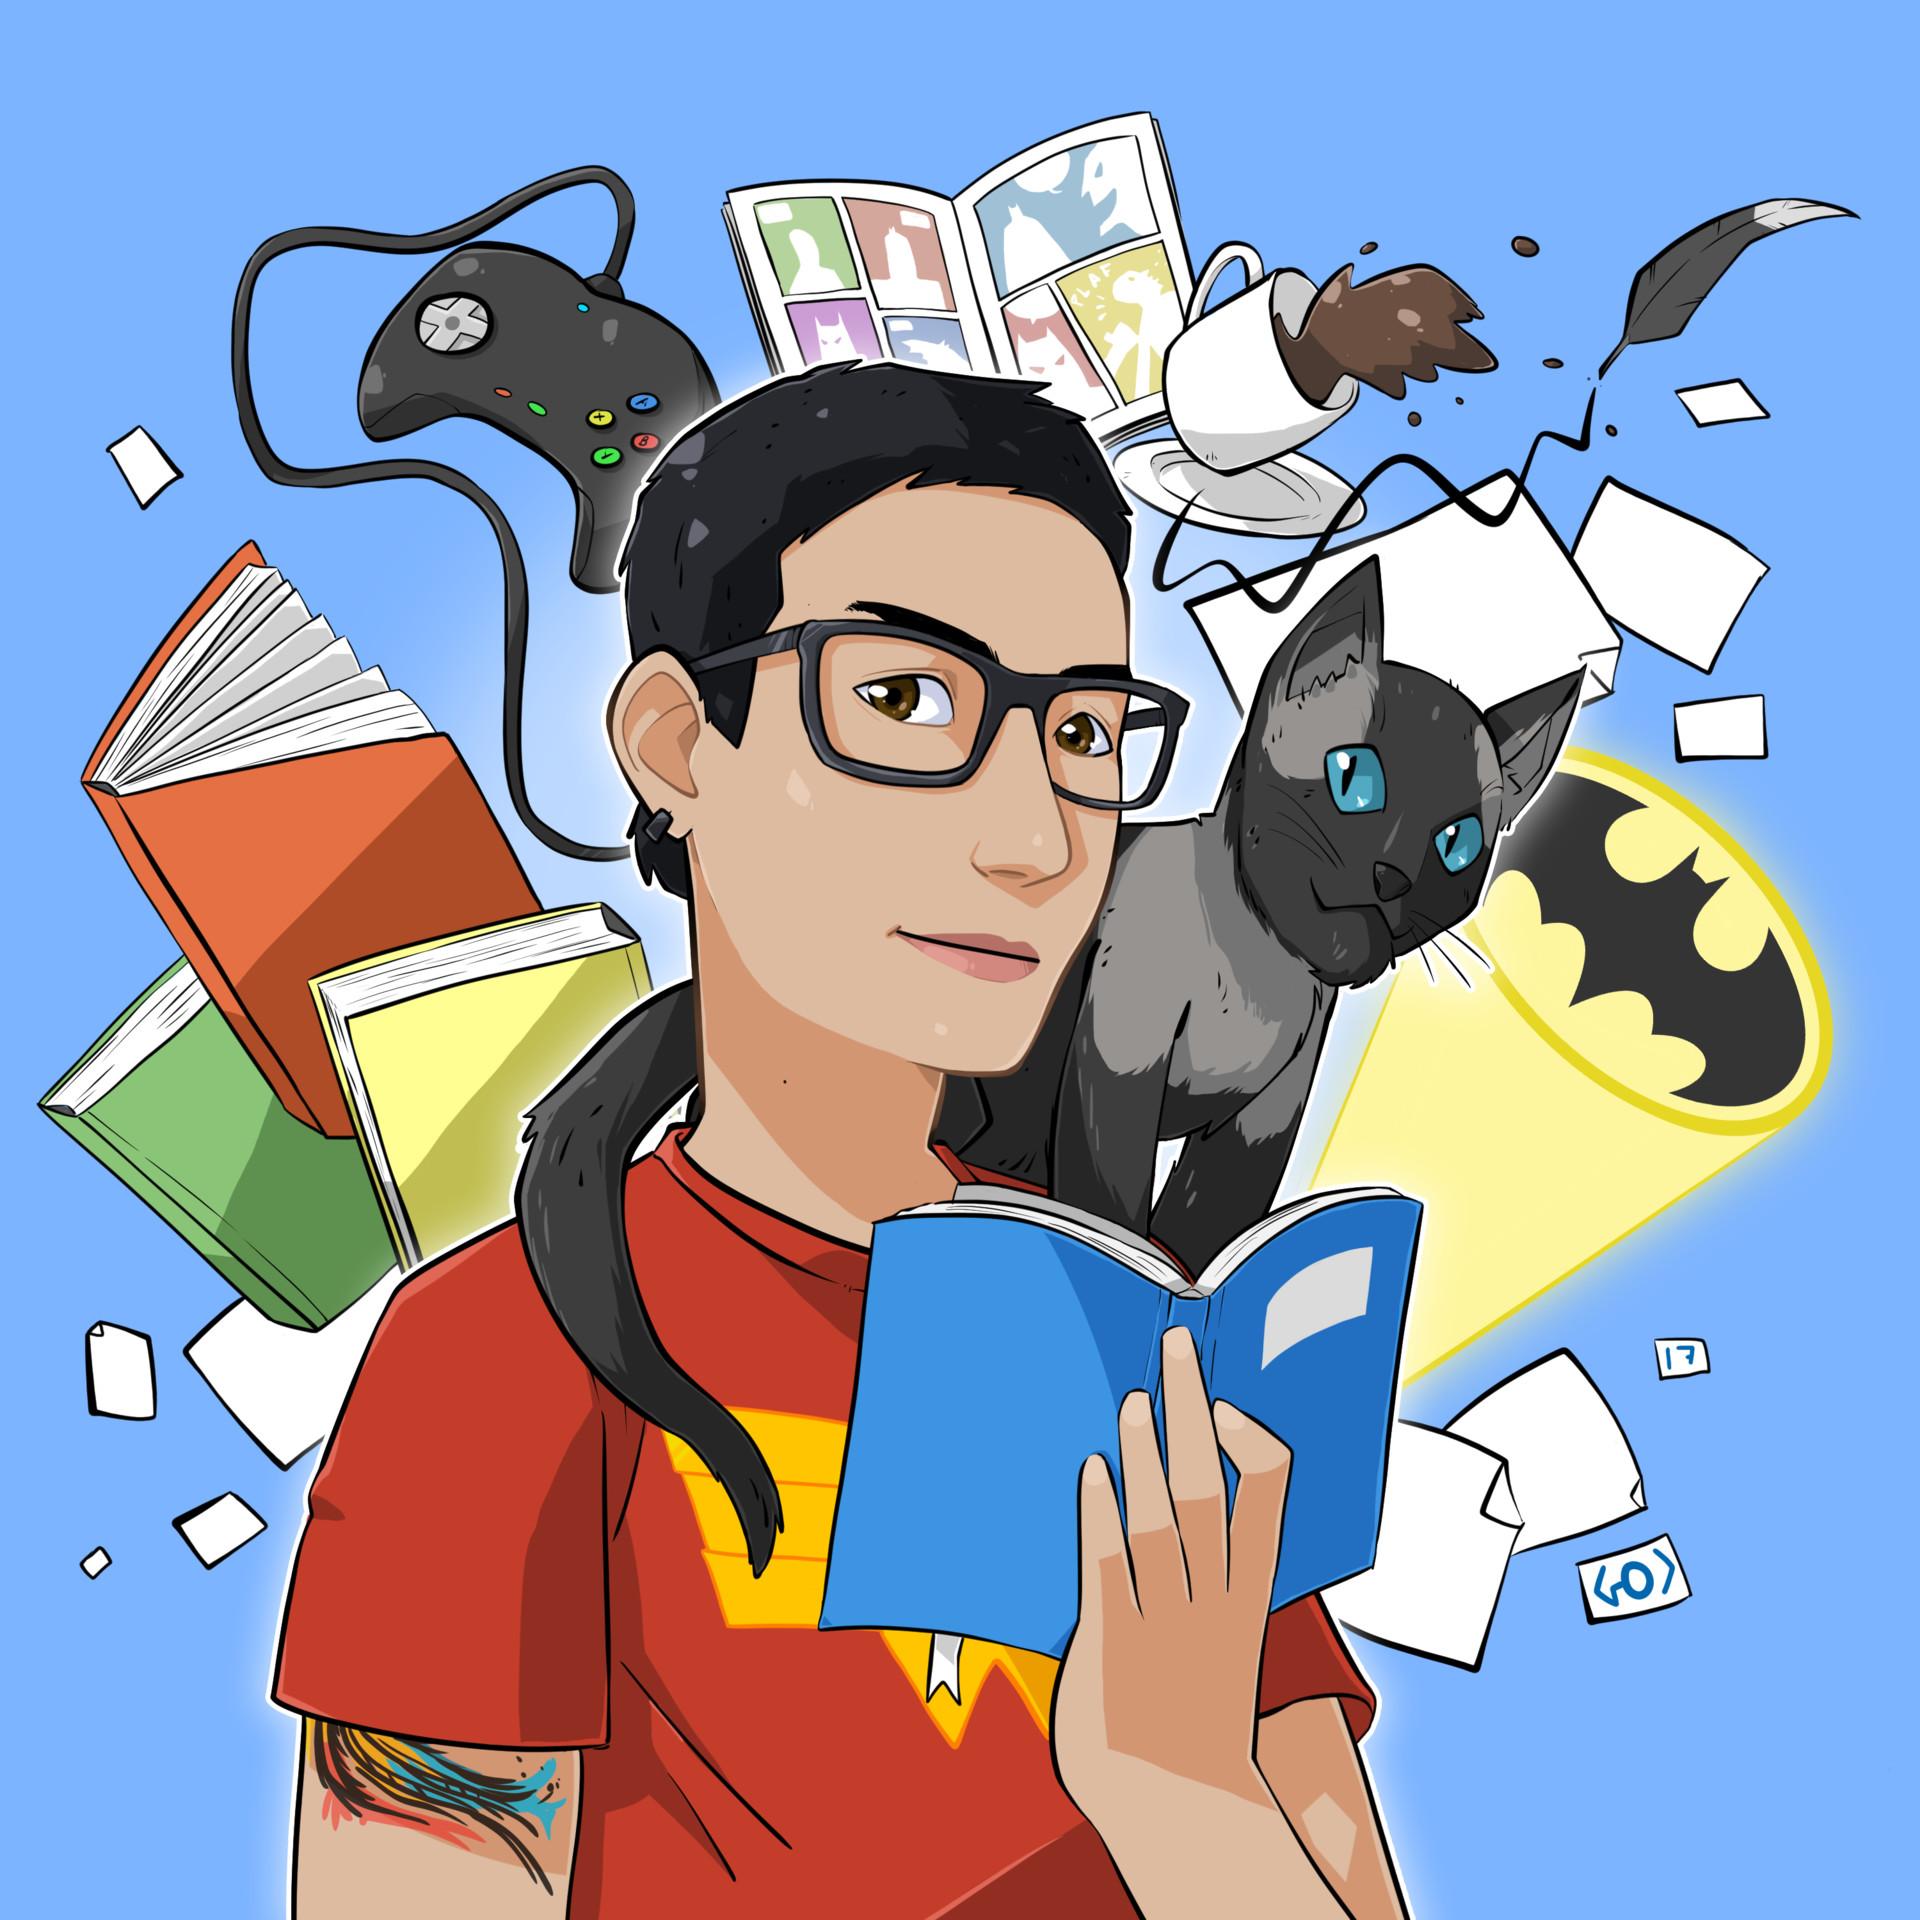 Diego martinez avatar